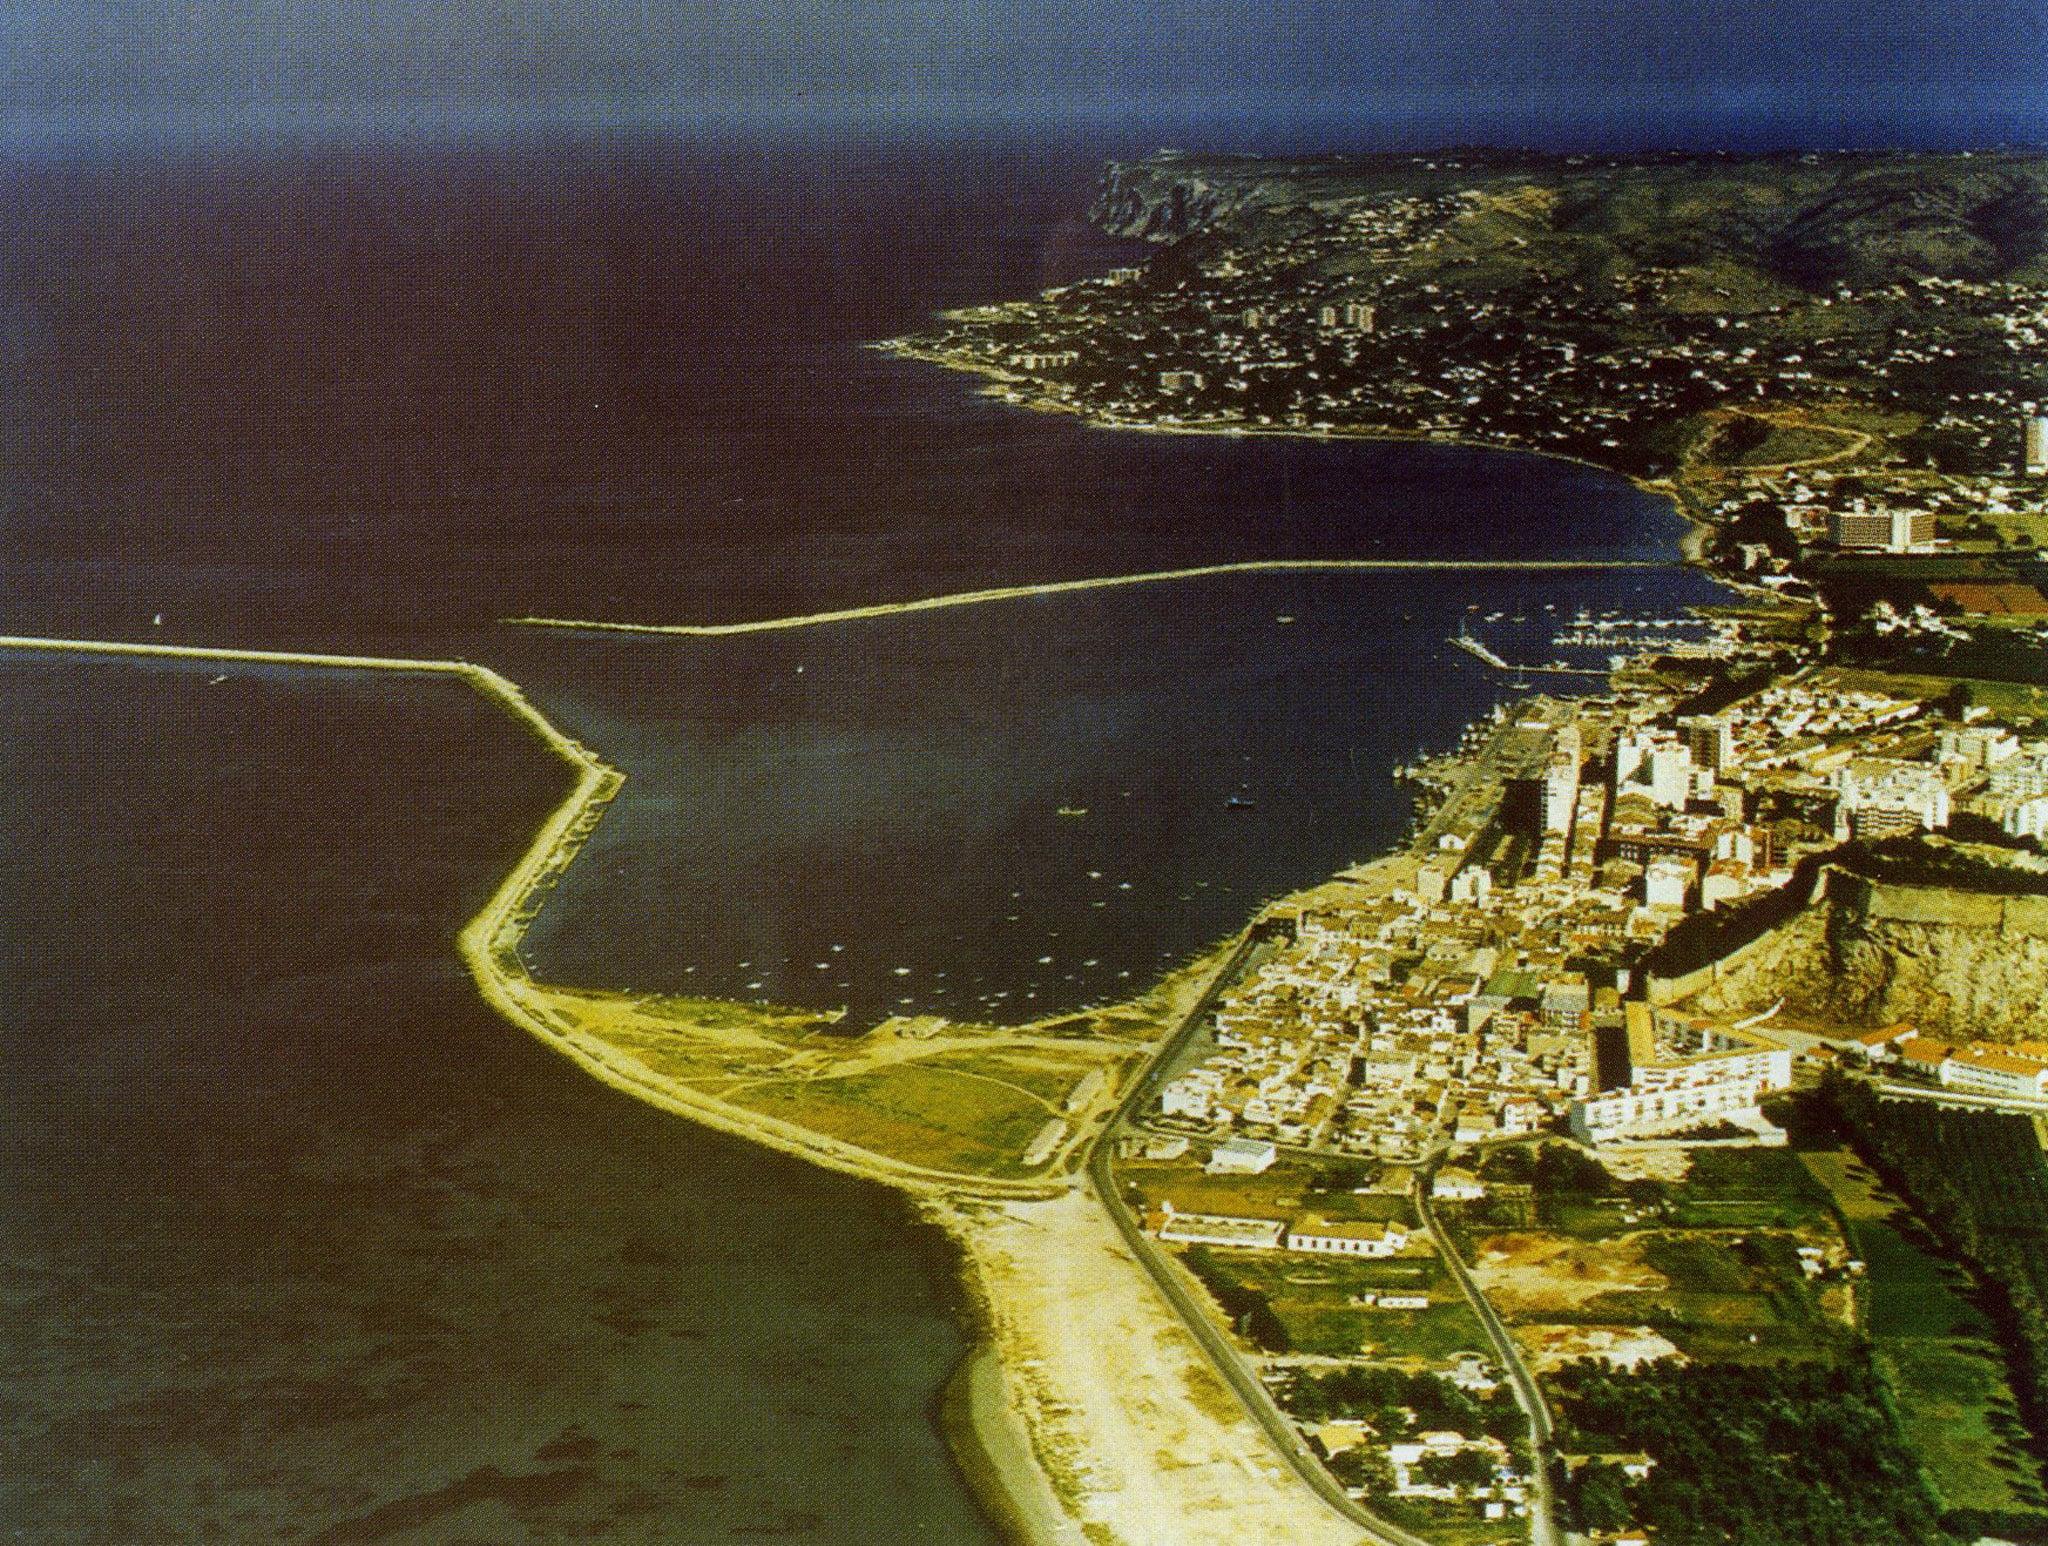 Vista aérea del puerto de Dénia hace varias décadas (Foto: «Historia de la Marina Alta. Tomo I», de Josep Antoni Gisbert). Proporcionada por l'Arxiu Municipal